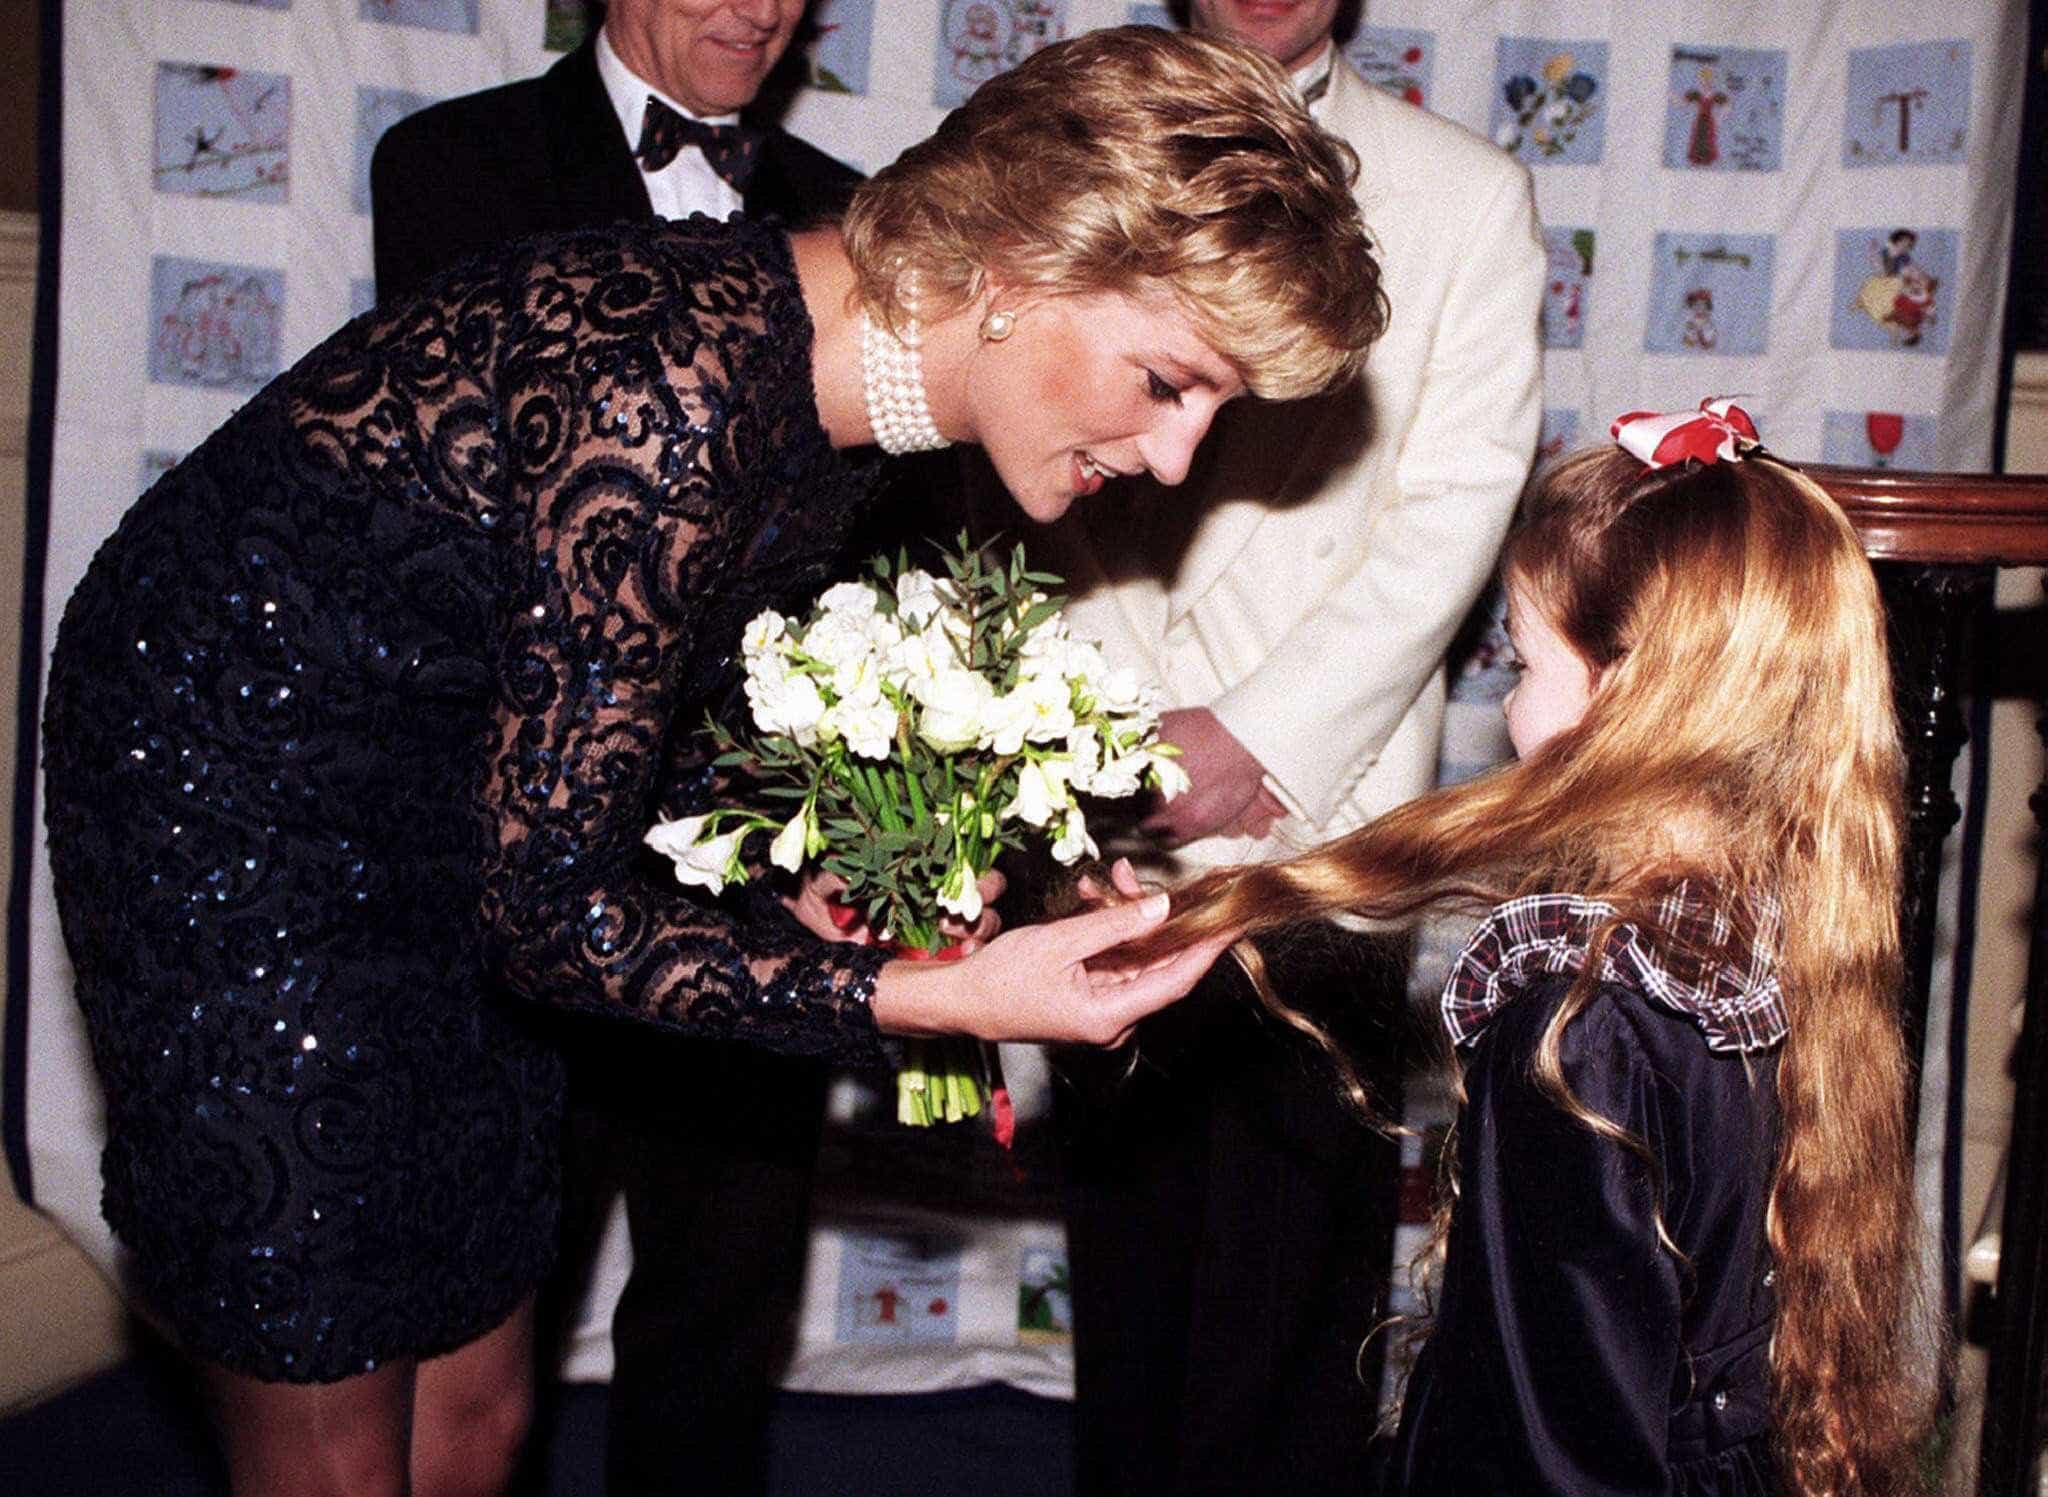 Princesa Diana recusava usar luvas. Saiba porquê